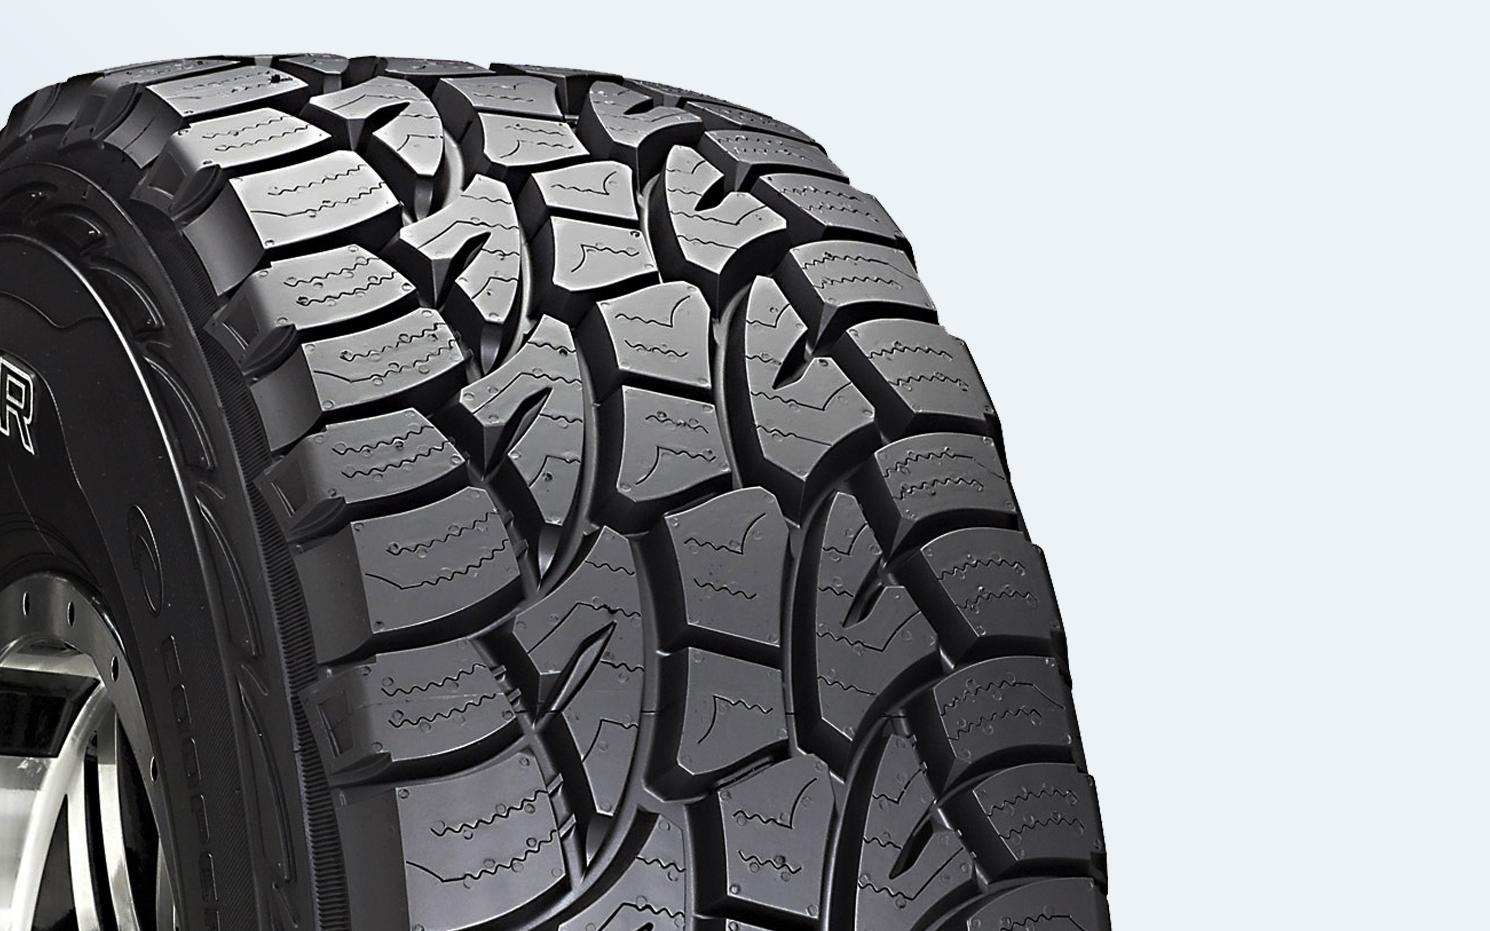 Best Tire Brands 2019 - Reviews of All-Season/Terrain, Mud